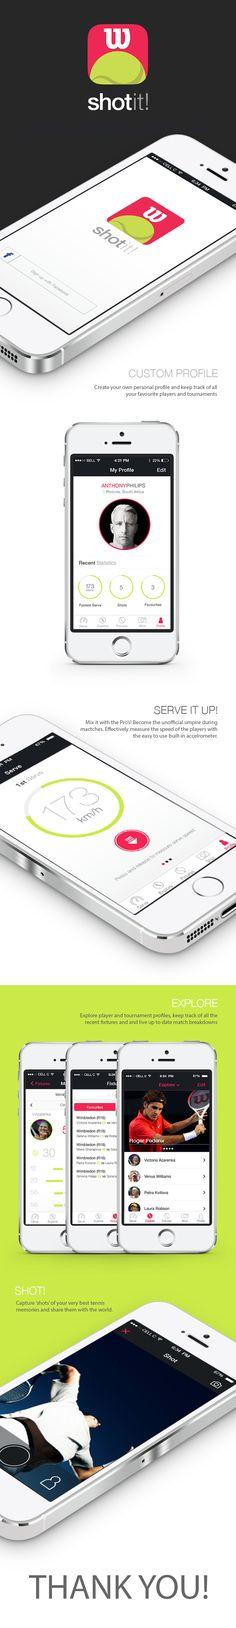 Shot It! iOS7 App